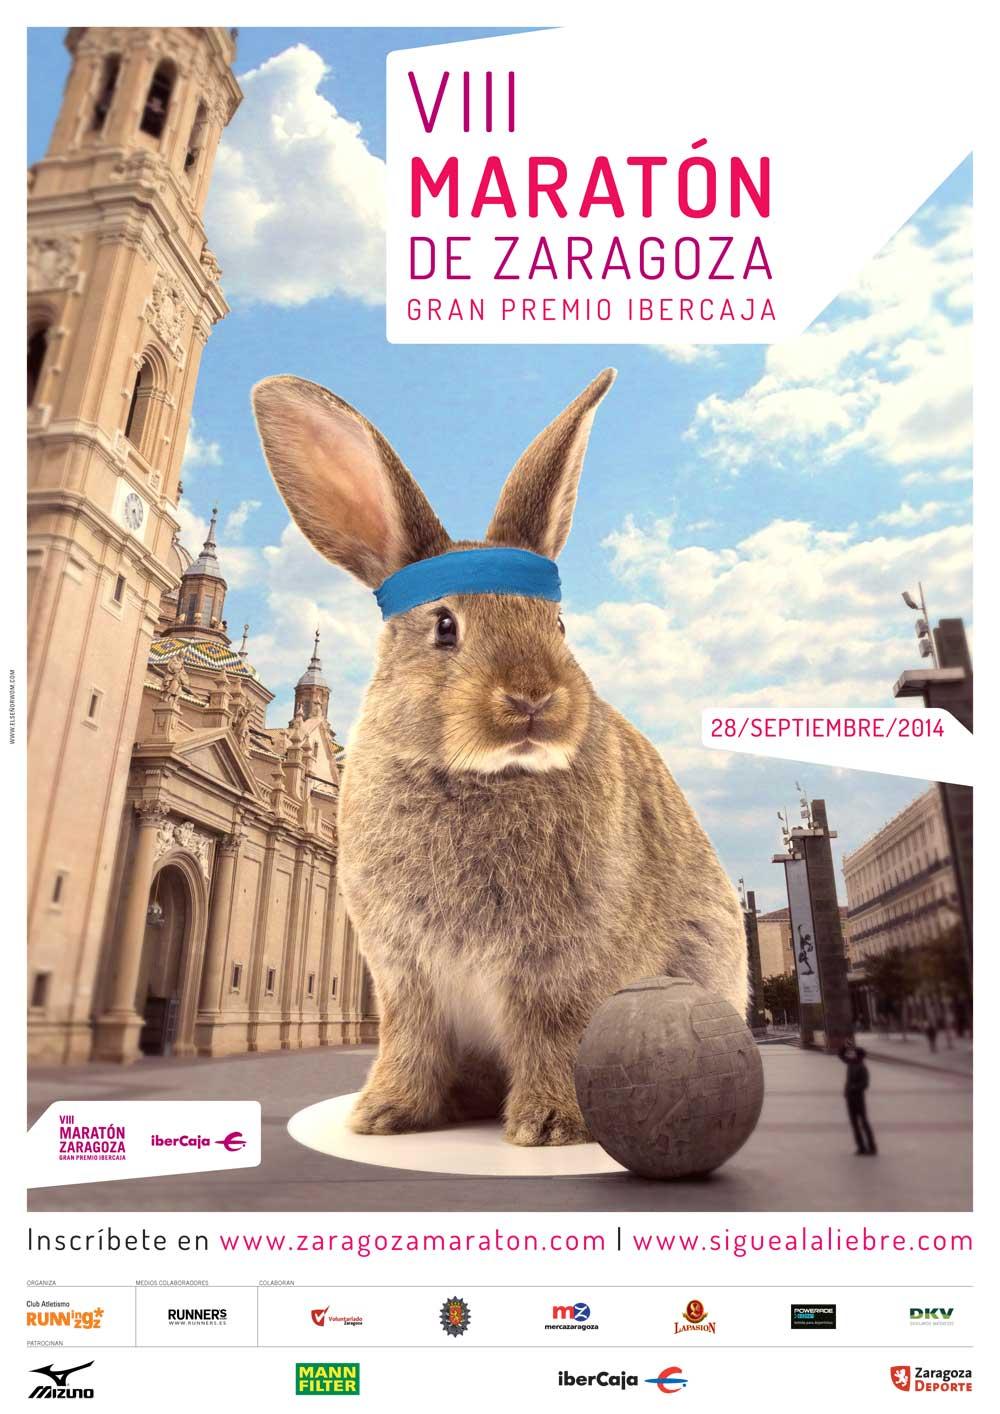 VIII MARATÓN DE ZARAGOZA - GRAN PREMIO IBERCAJA - Inscrivez-vous